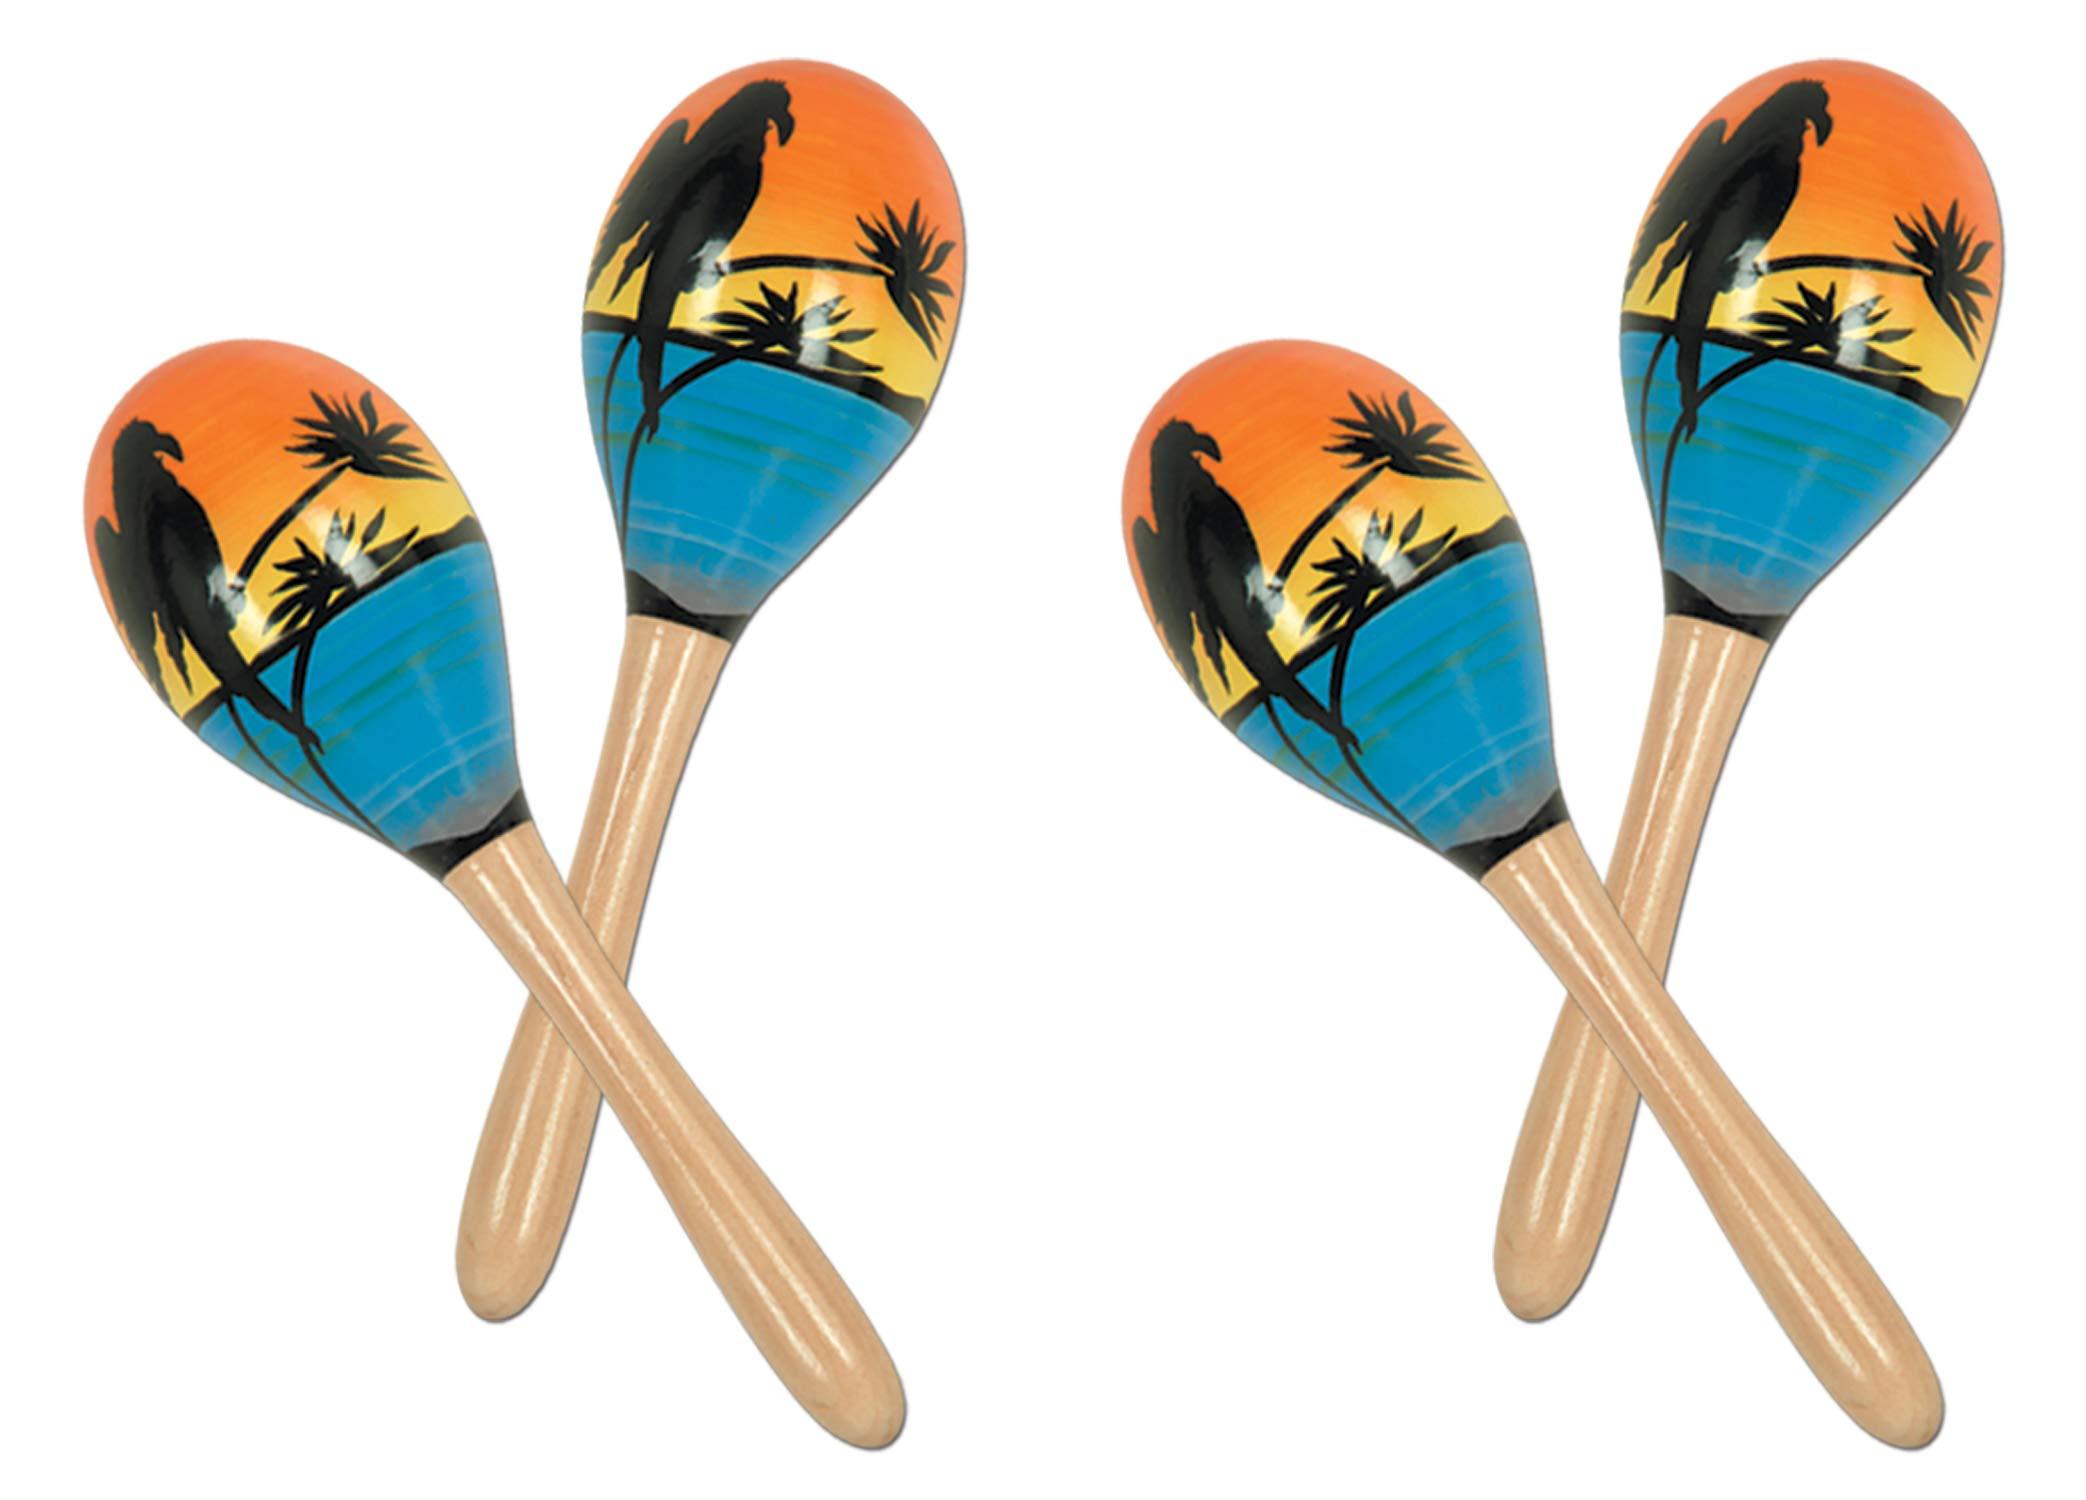 Beistle S60950-8AZ2 Tropical Fun Party Maracas 4 Piece, 8'', Multicolored